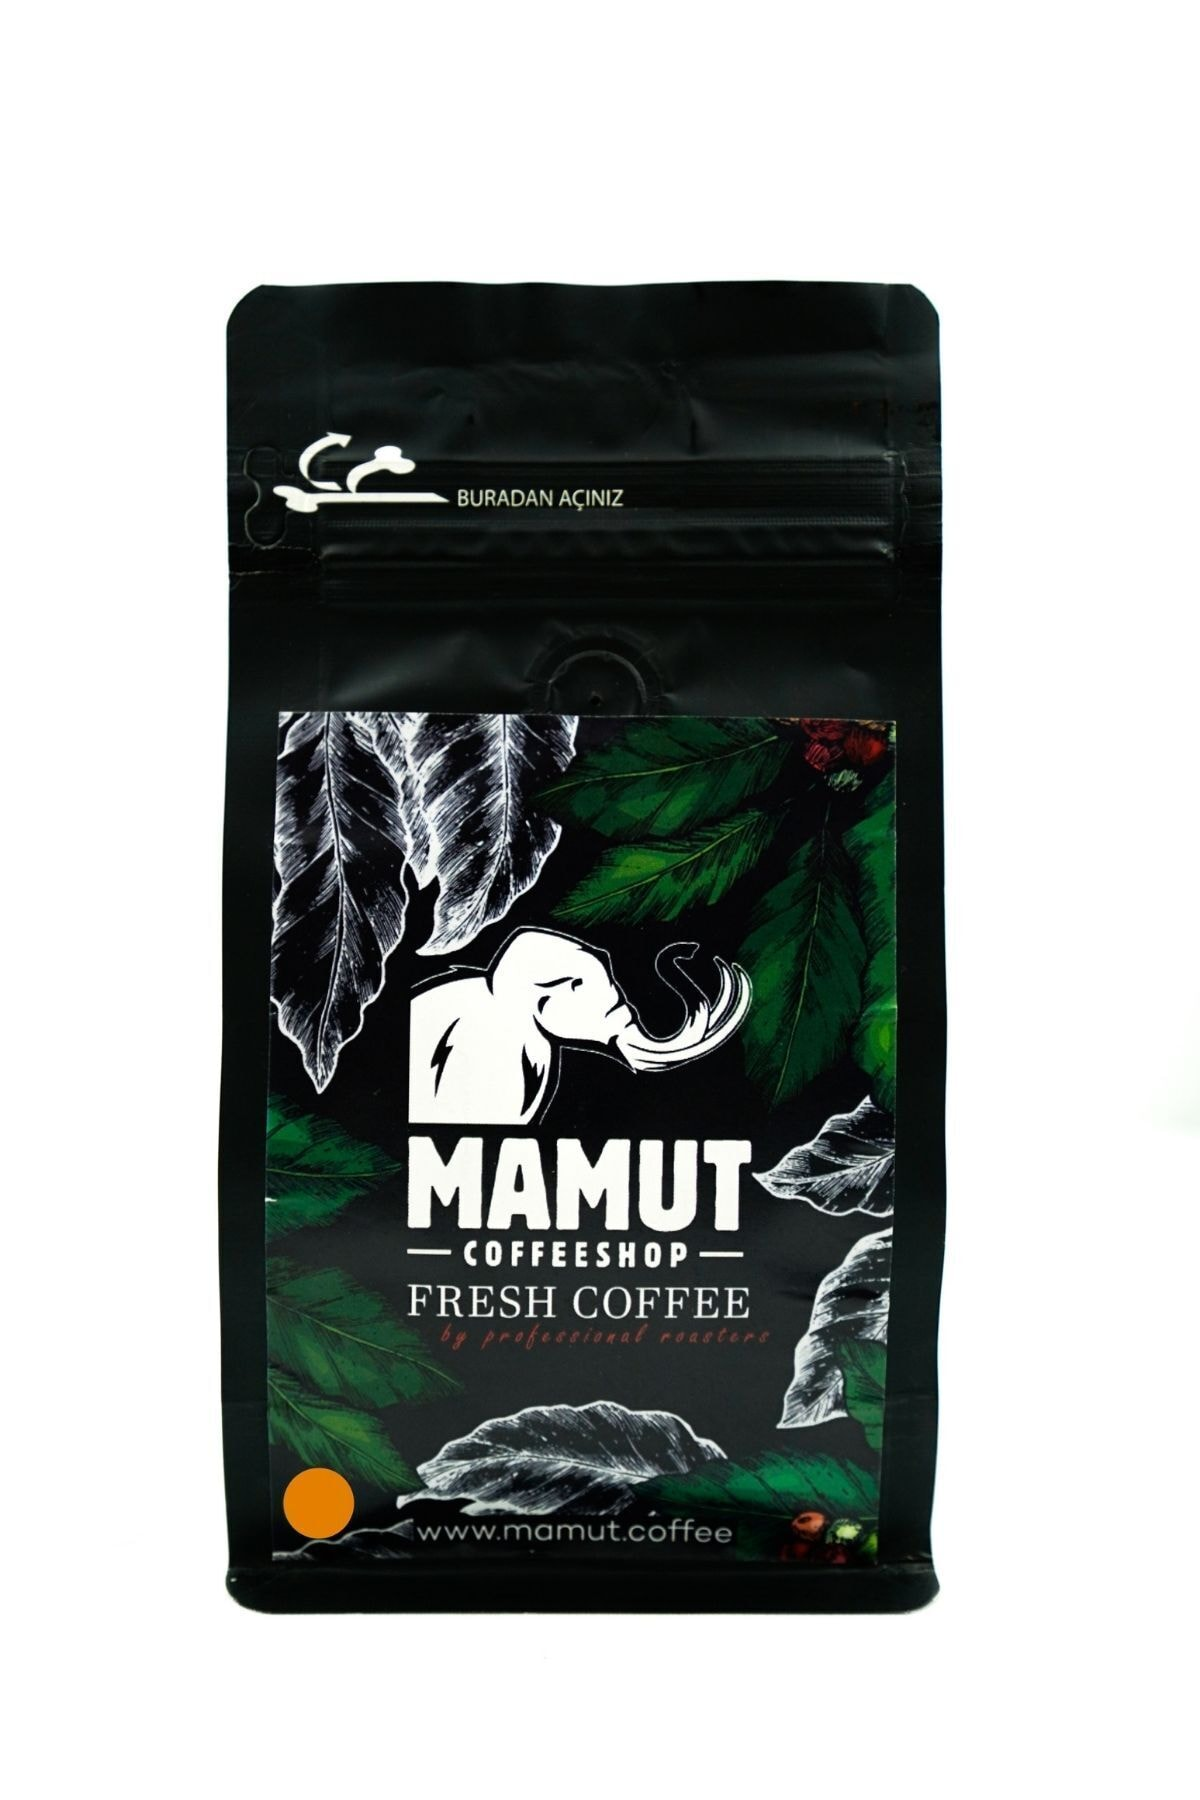 Mamut Coffeeshop - Barista Blend Espresso Öğütülmüş Kahve 500 gr